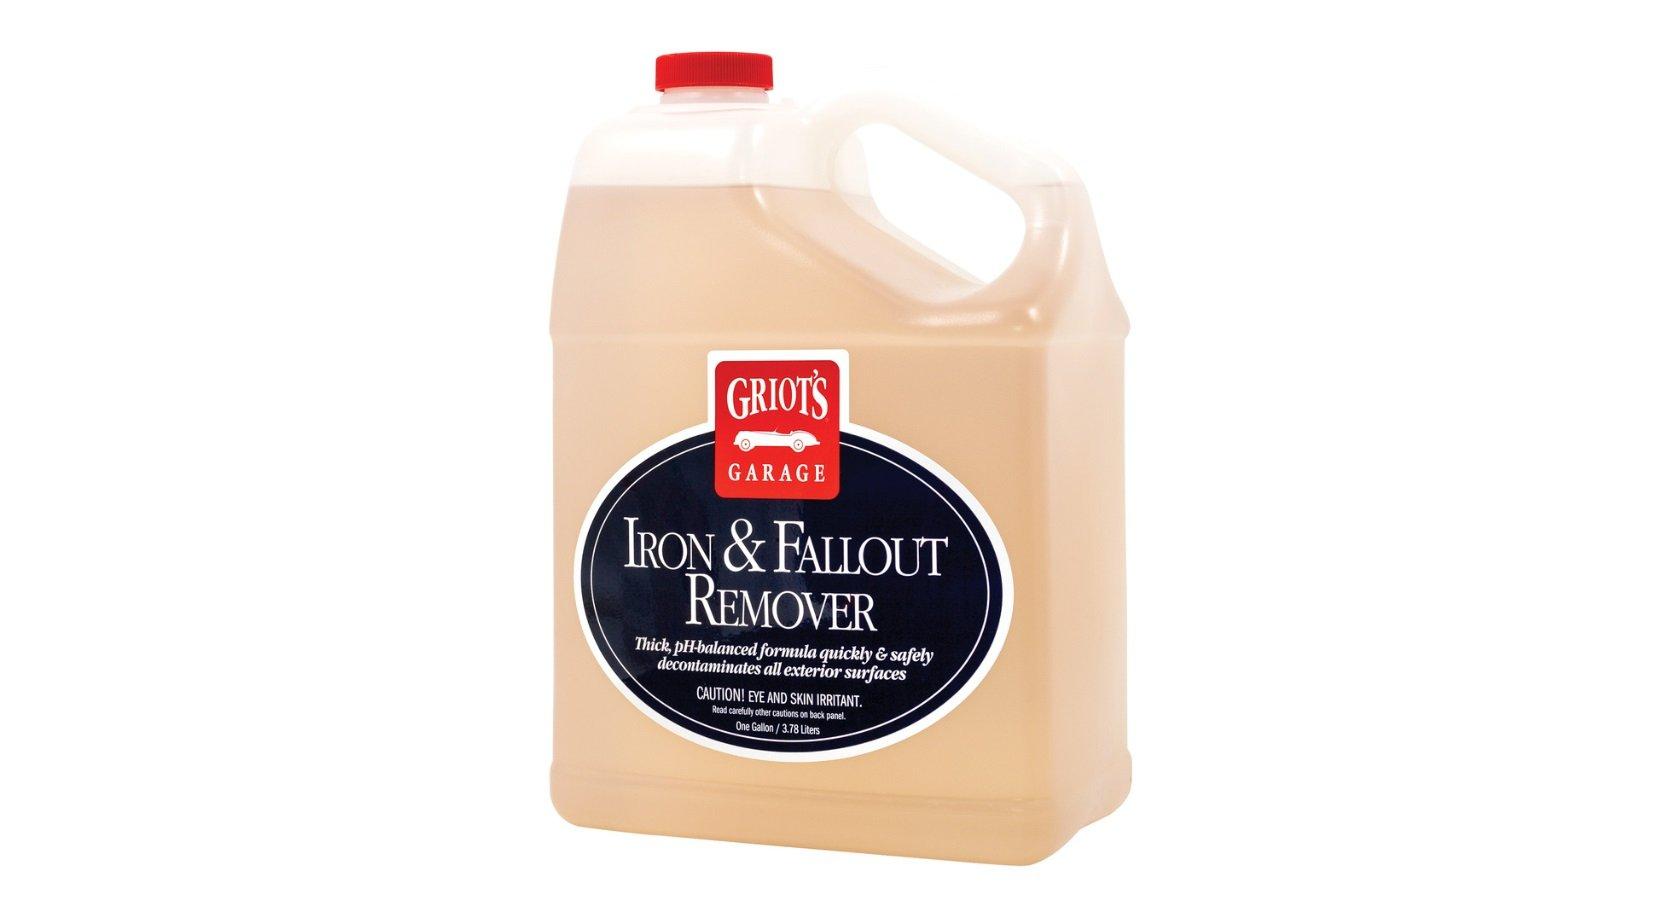 Griot's Garage 10949 Iron & Fallout Remover Gallon